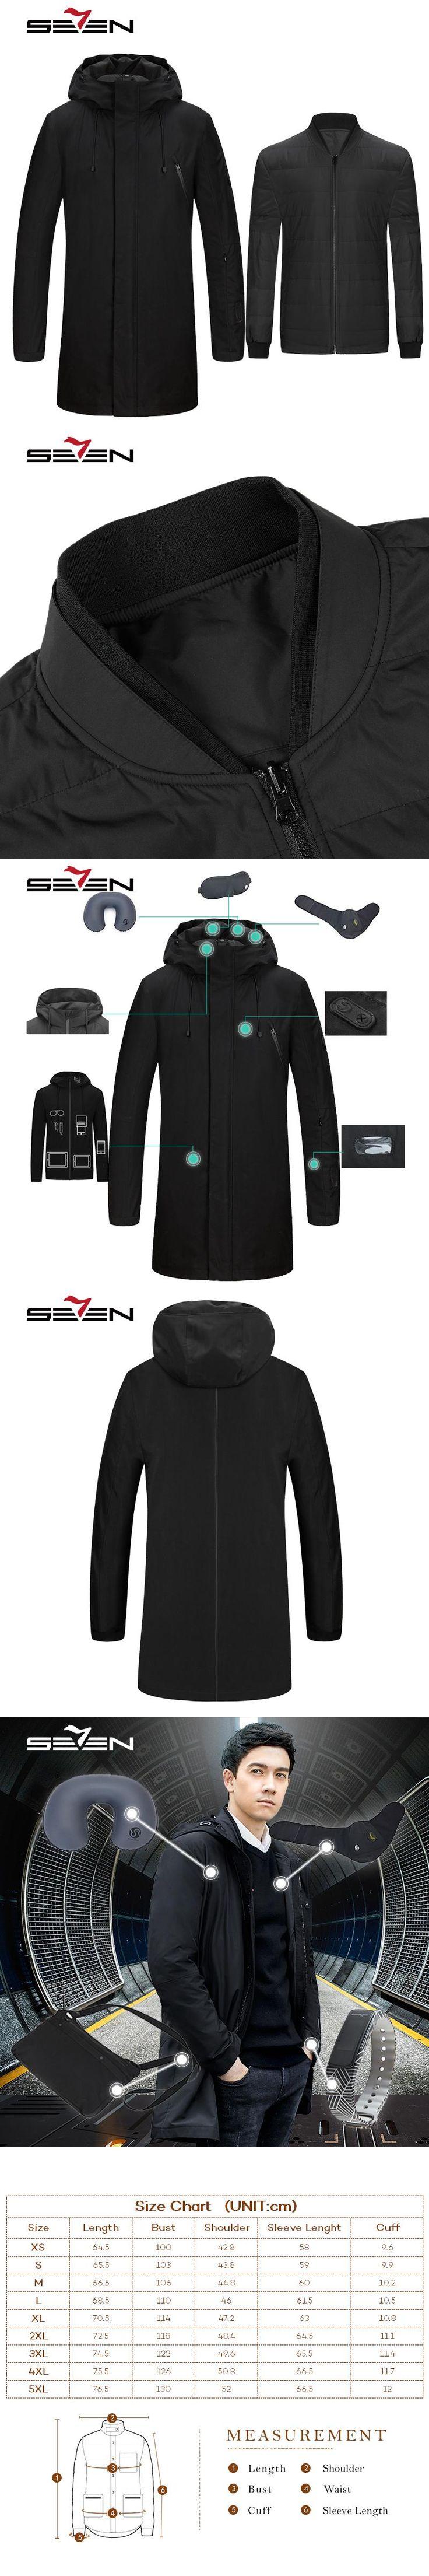 Seven7 Fashion Long Travel Jacket Men Smart Down Jacket Inner Parka Tablet Pockets Band Pillow Eye Mask Built-in Glove 113K20440